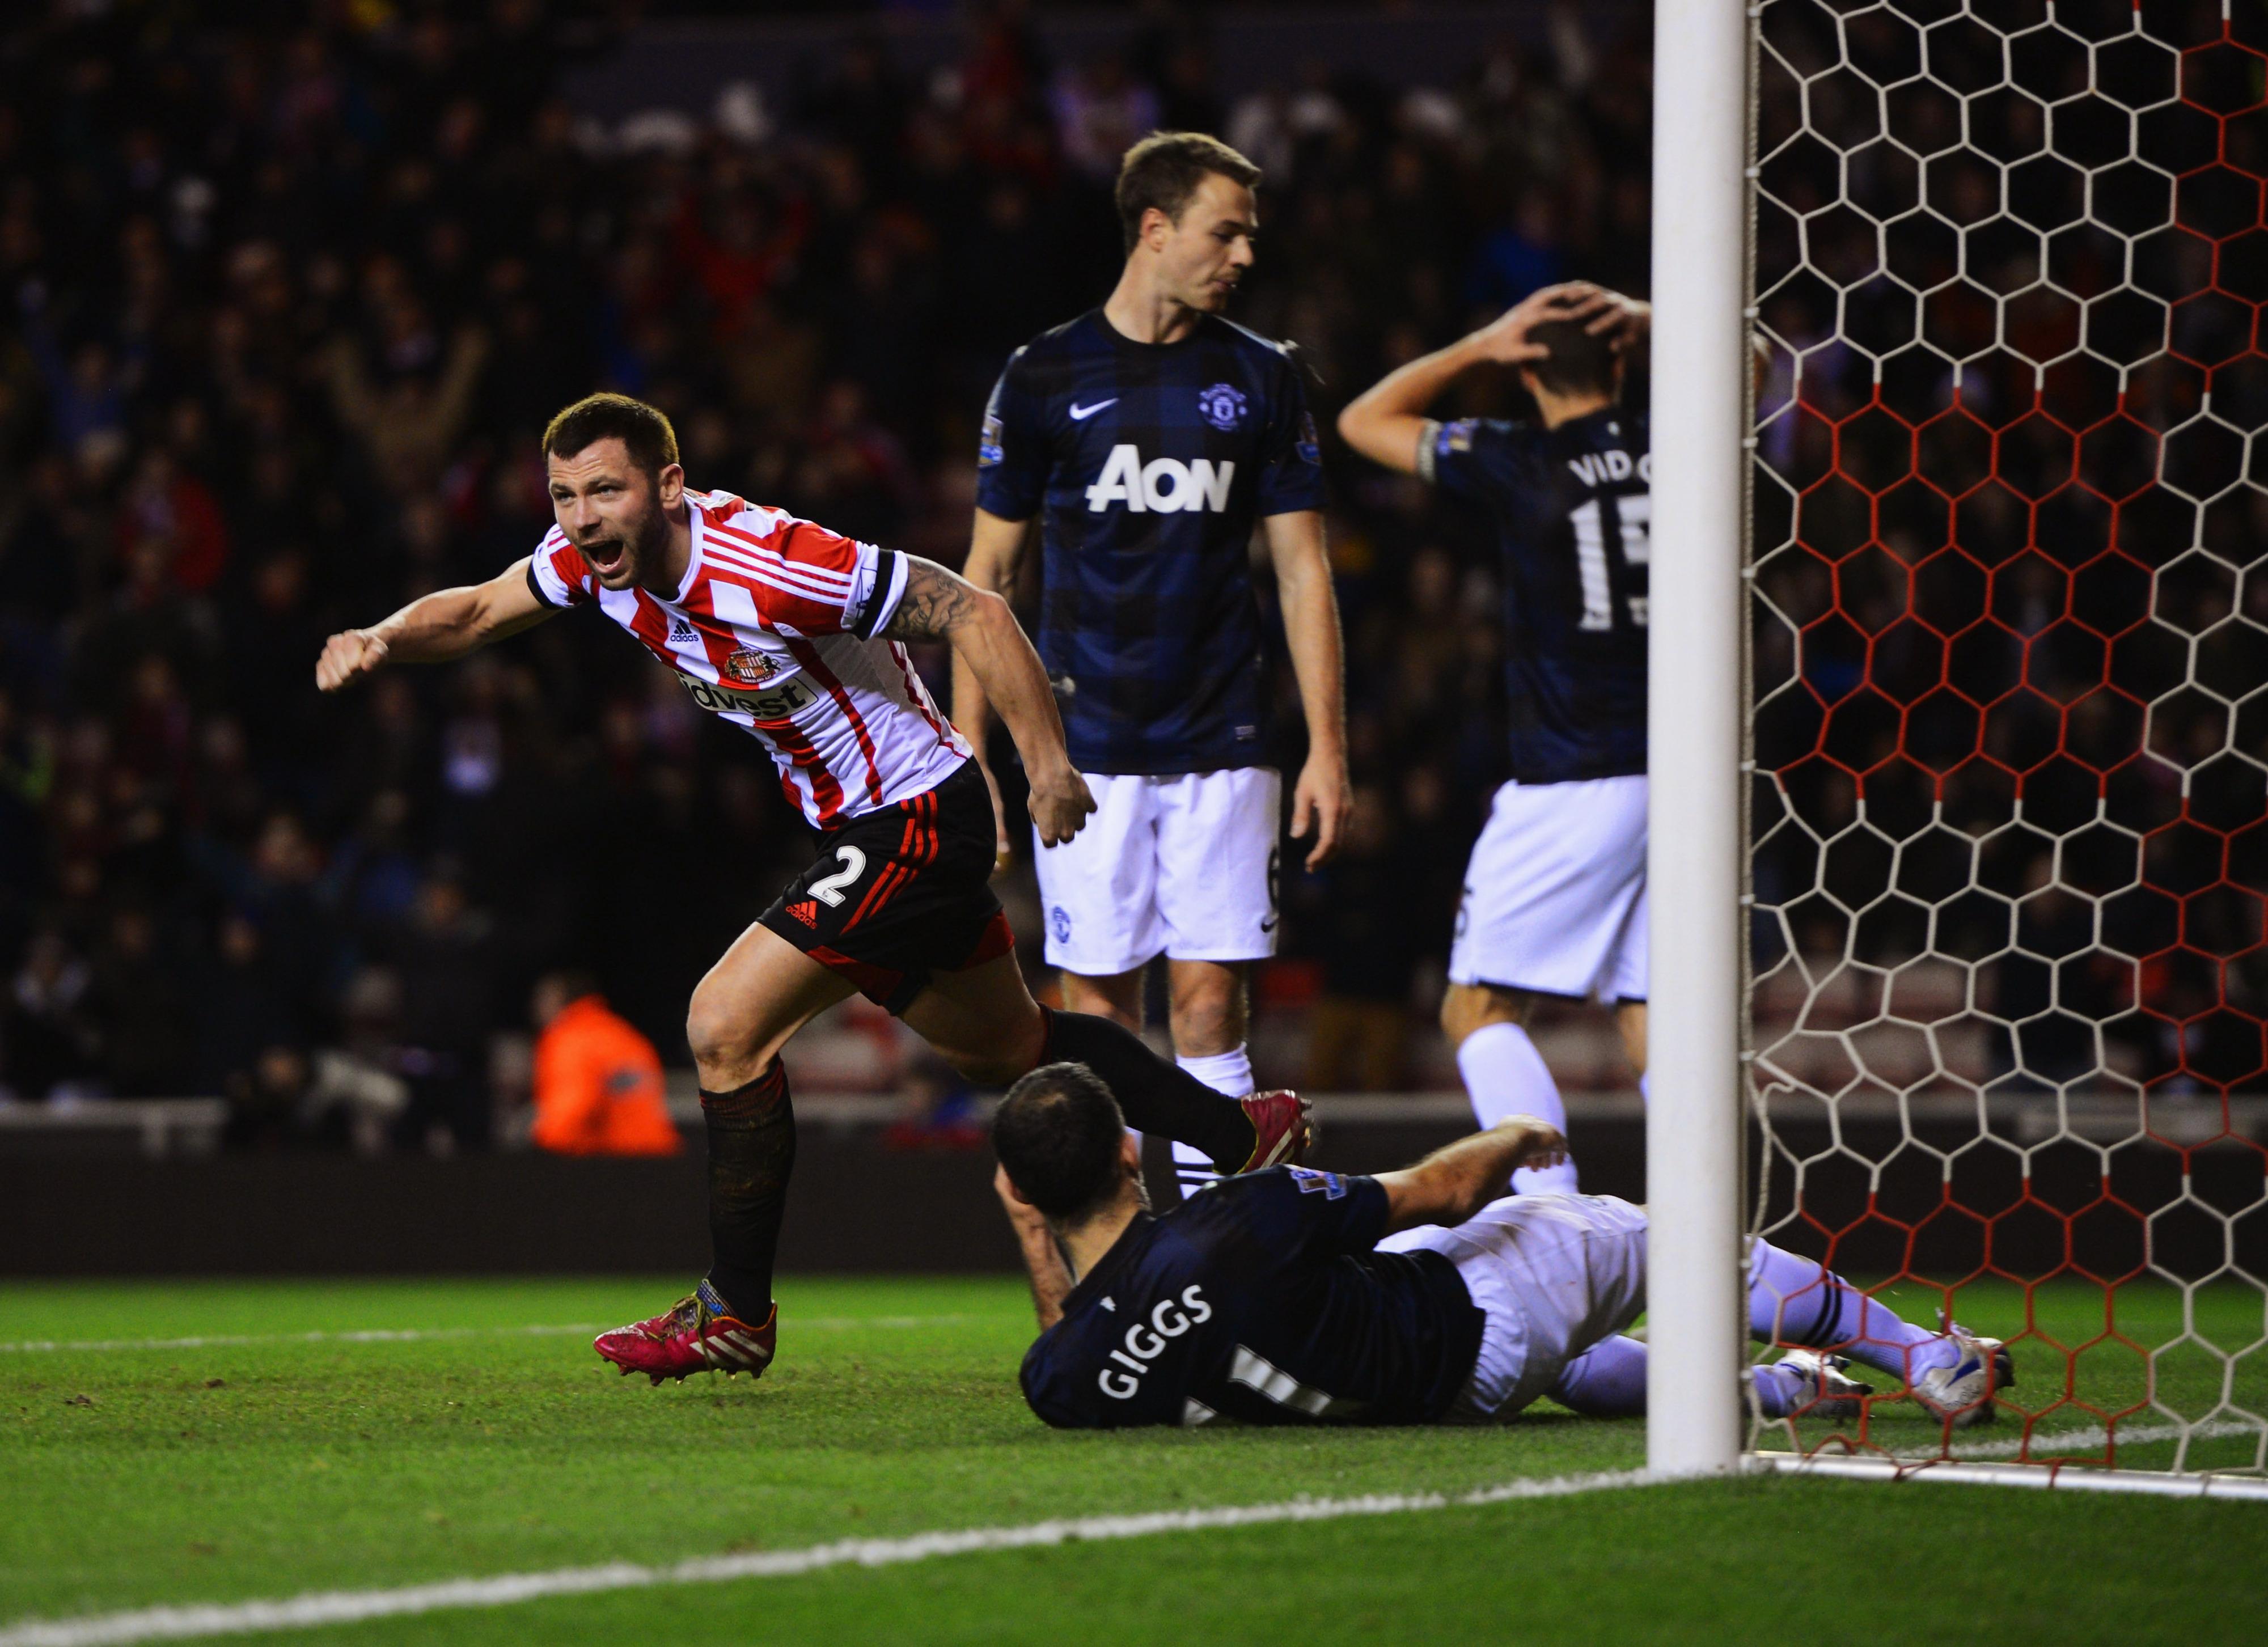 Sunderland vs. Manchester United: Final score 2-1, Black Cats take lead into second leg